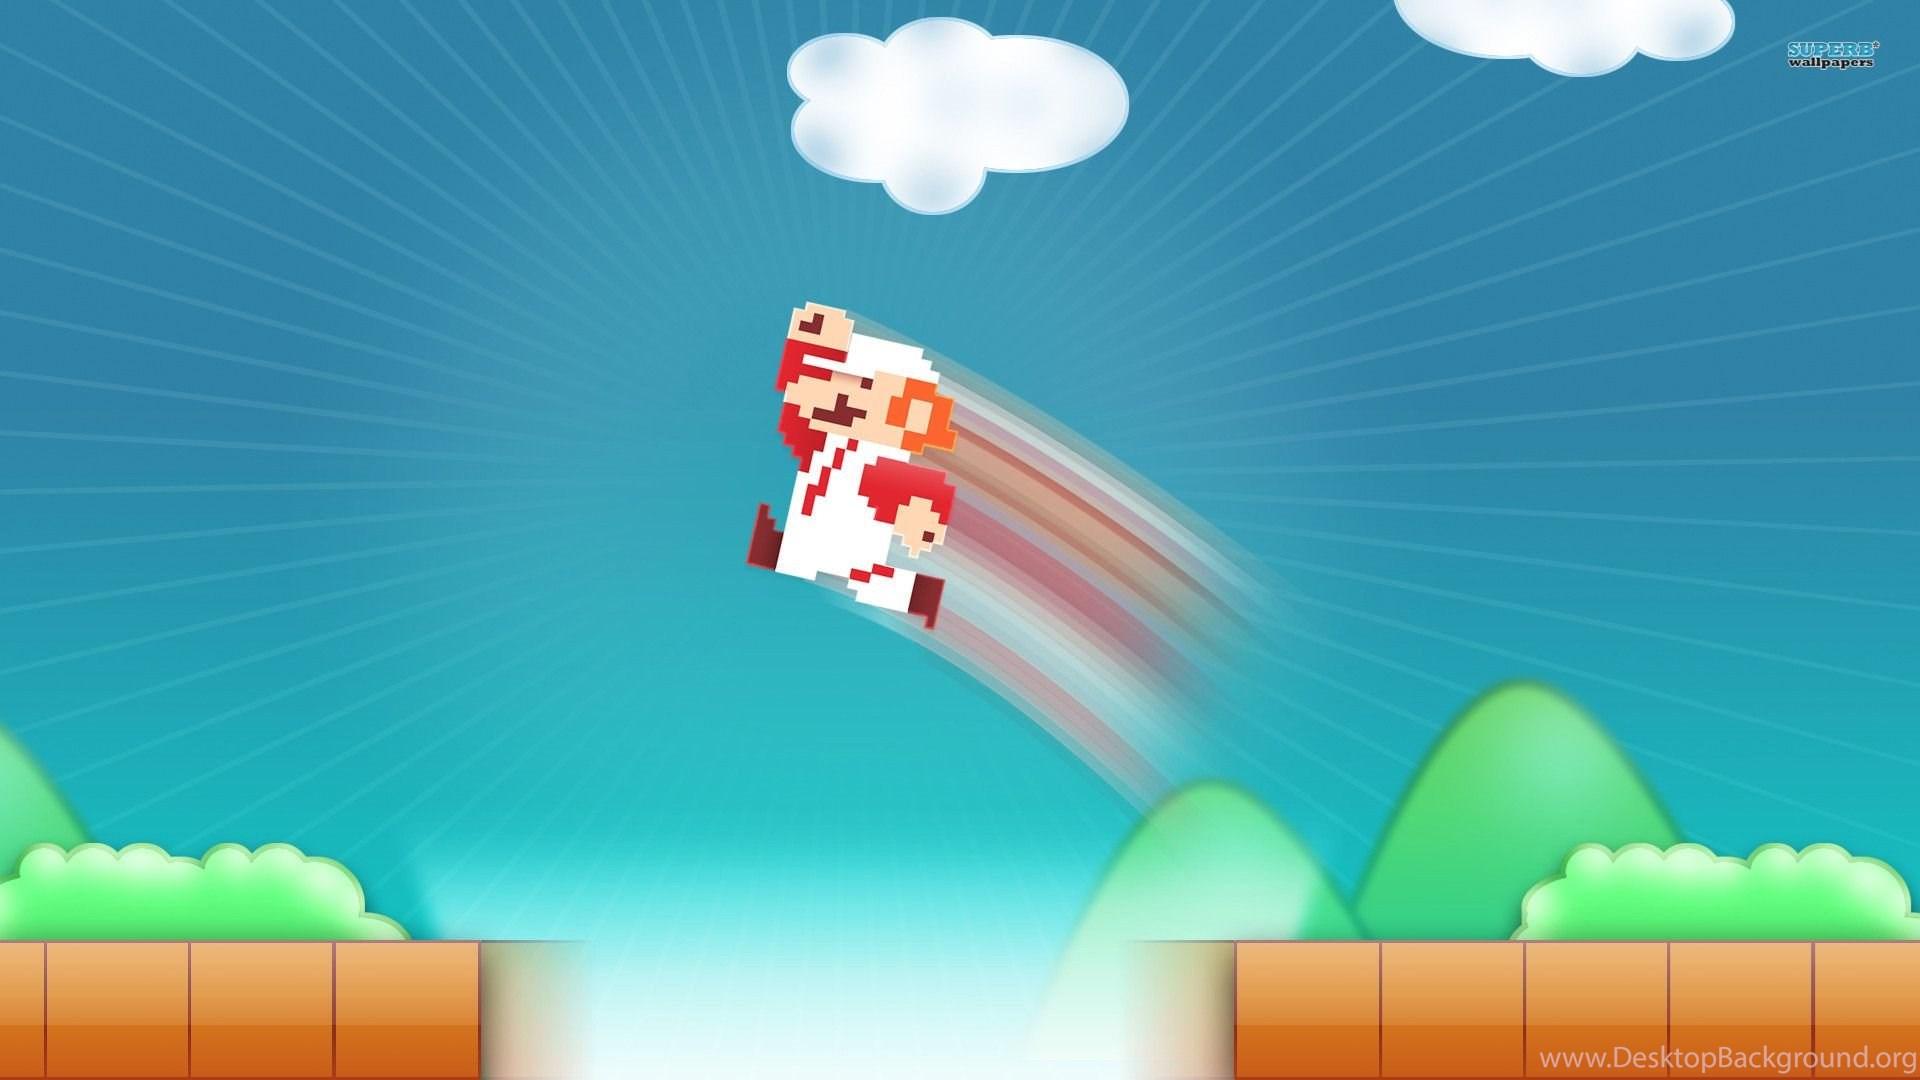 Super Mario Bros 3 Wallpapers Game Wallpapers Desktop Background